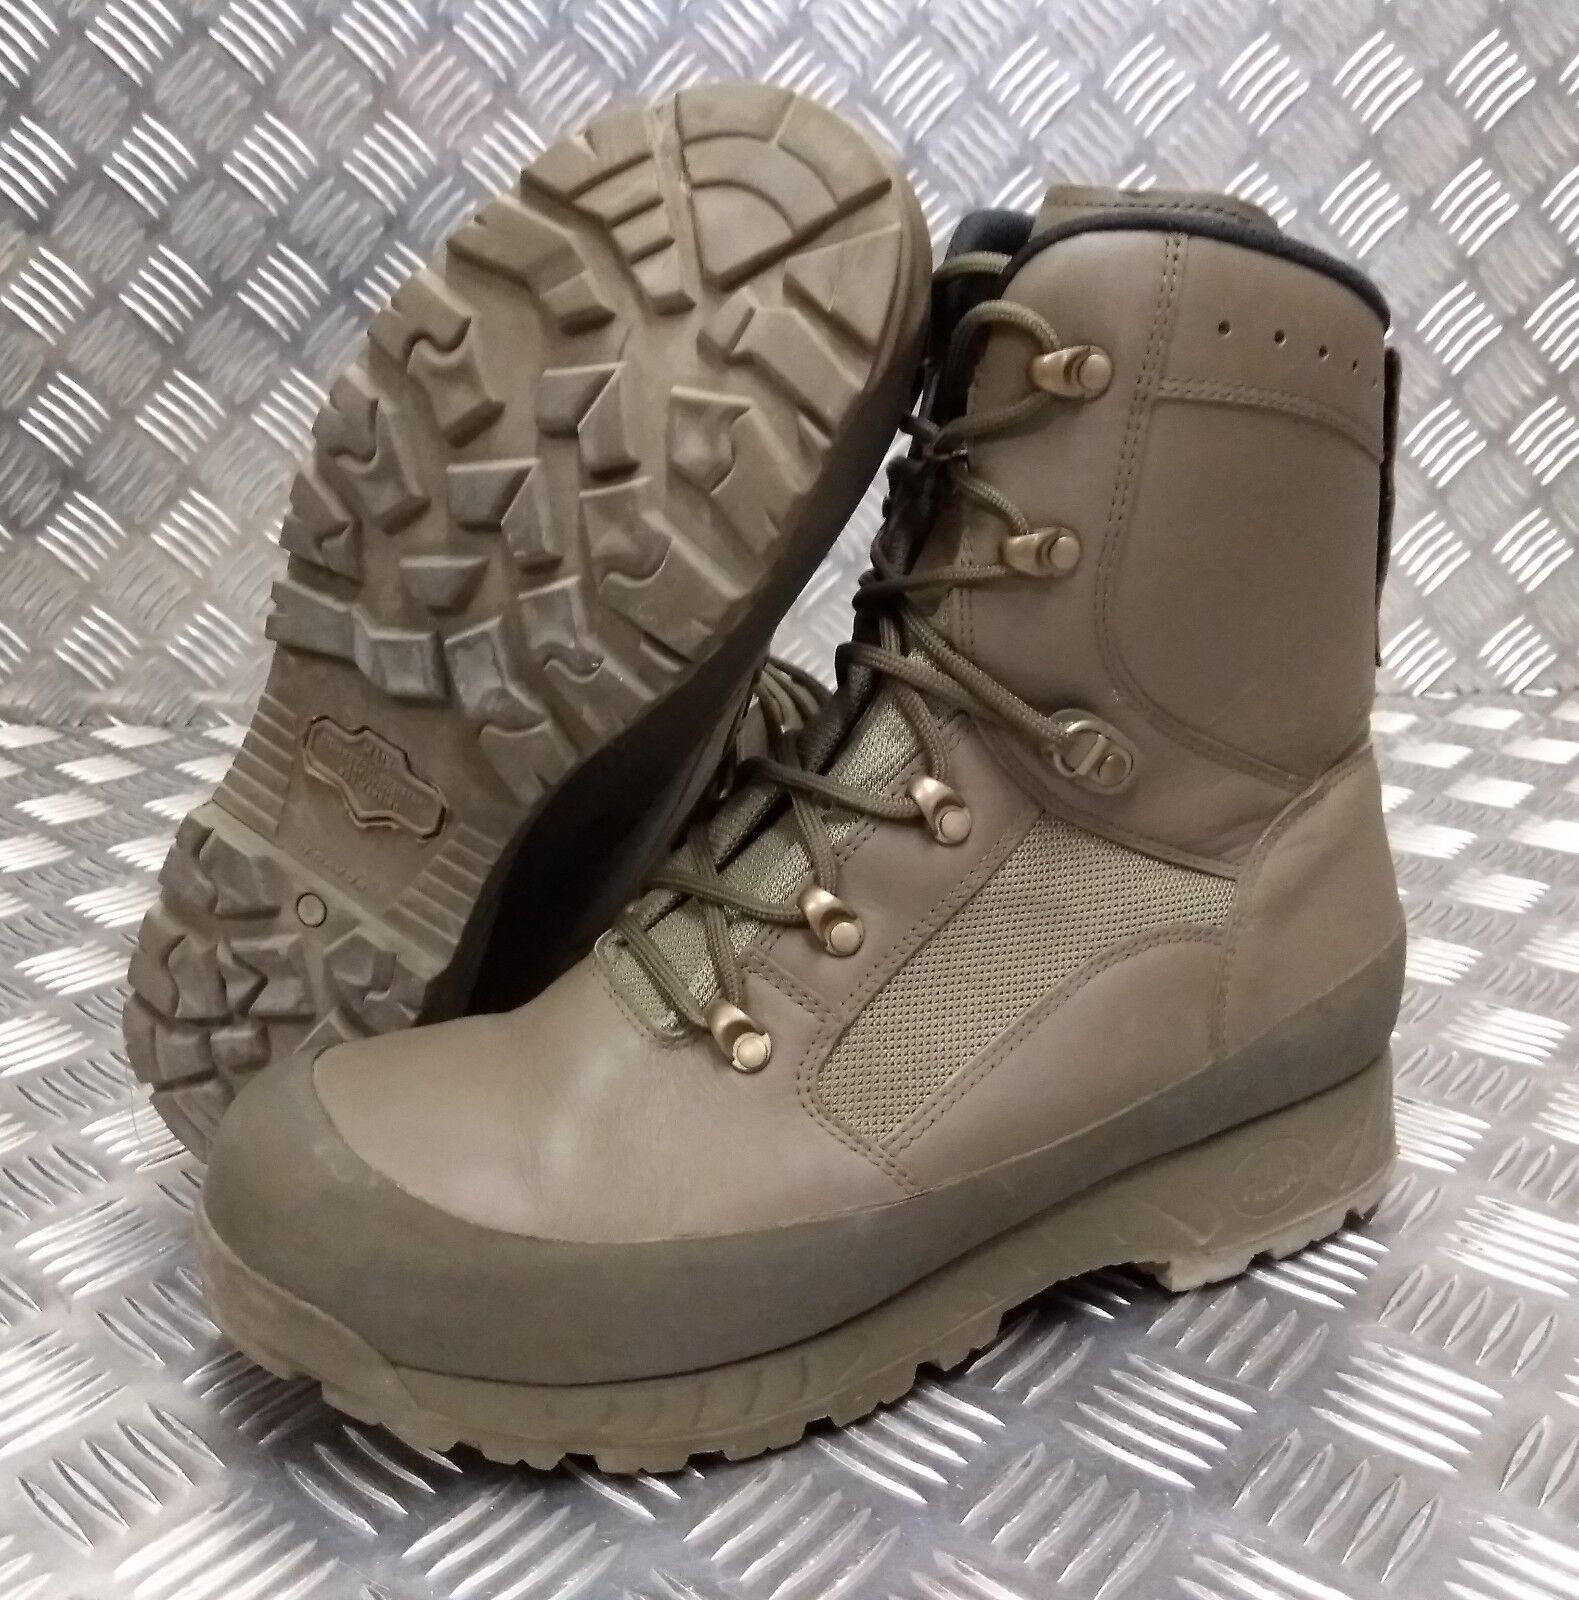 Genuine British Trial Army Haix Desert Combat Leather Assault / Patrol Combat Desert Boots SL 363ed5